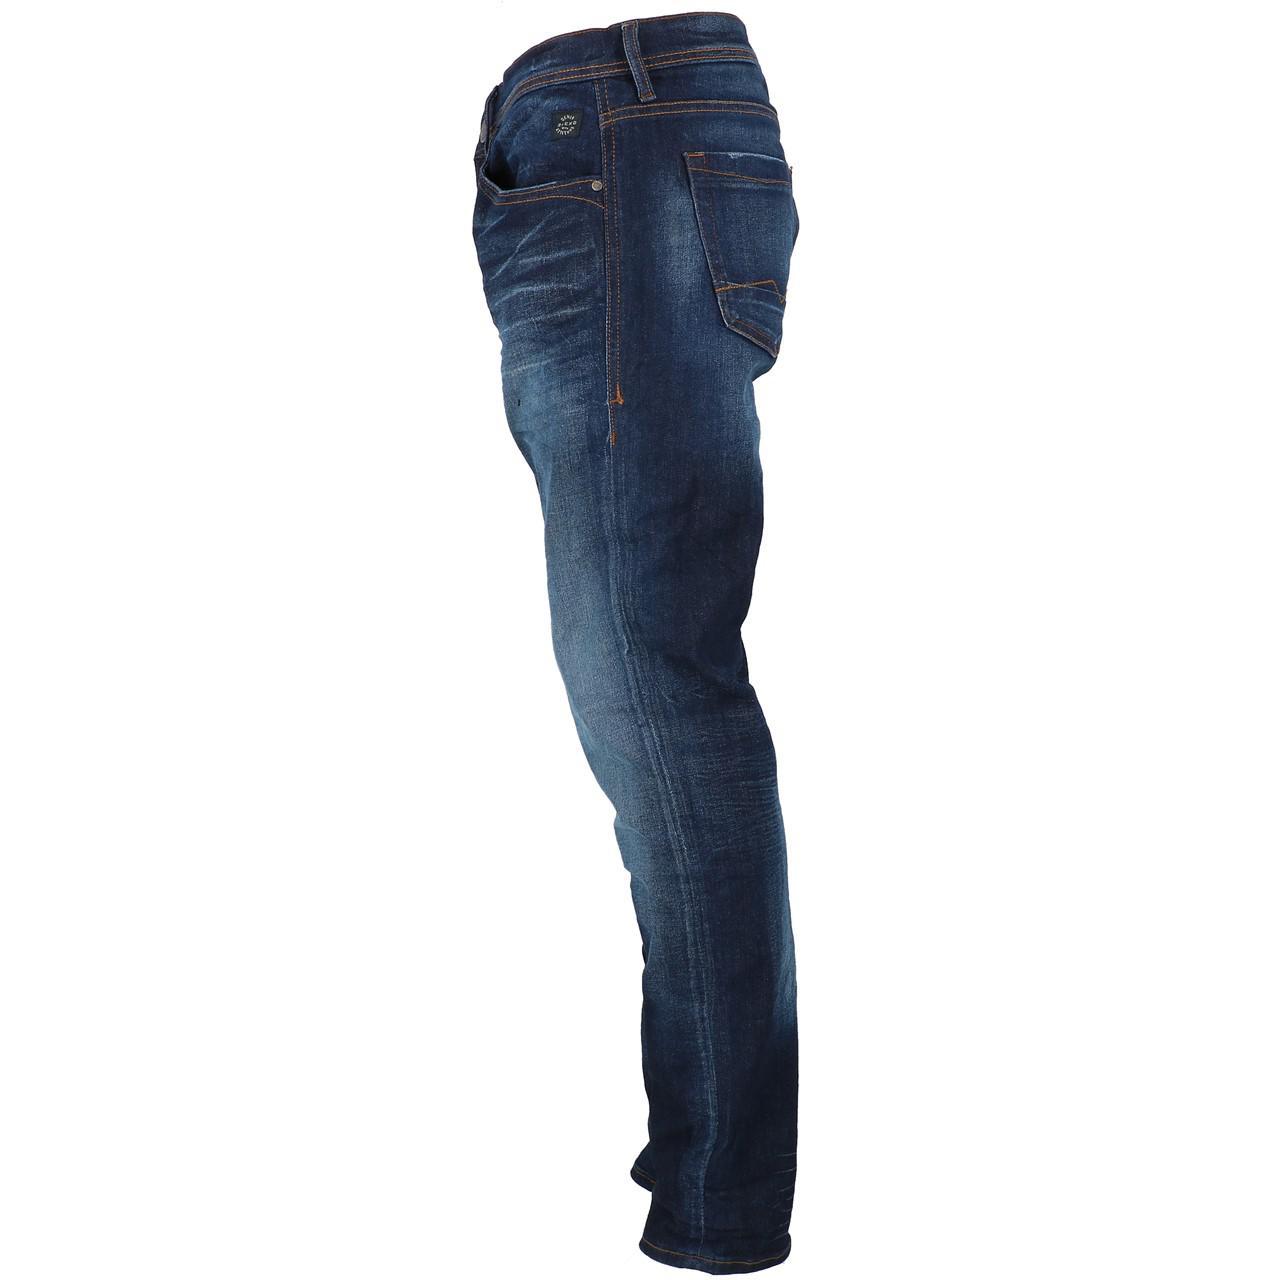 Jeans-Pants-Slim-Blend-Twister-34-Denim-Dark-Reg-Blue-25943-New thumbnail 2